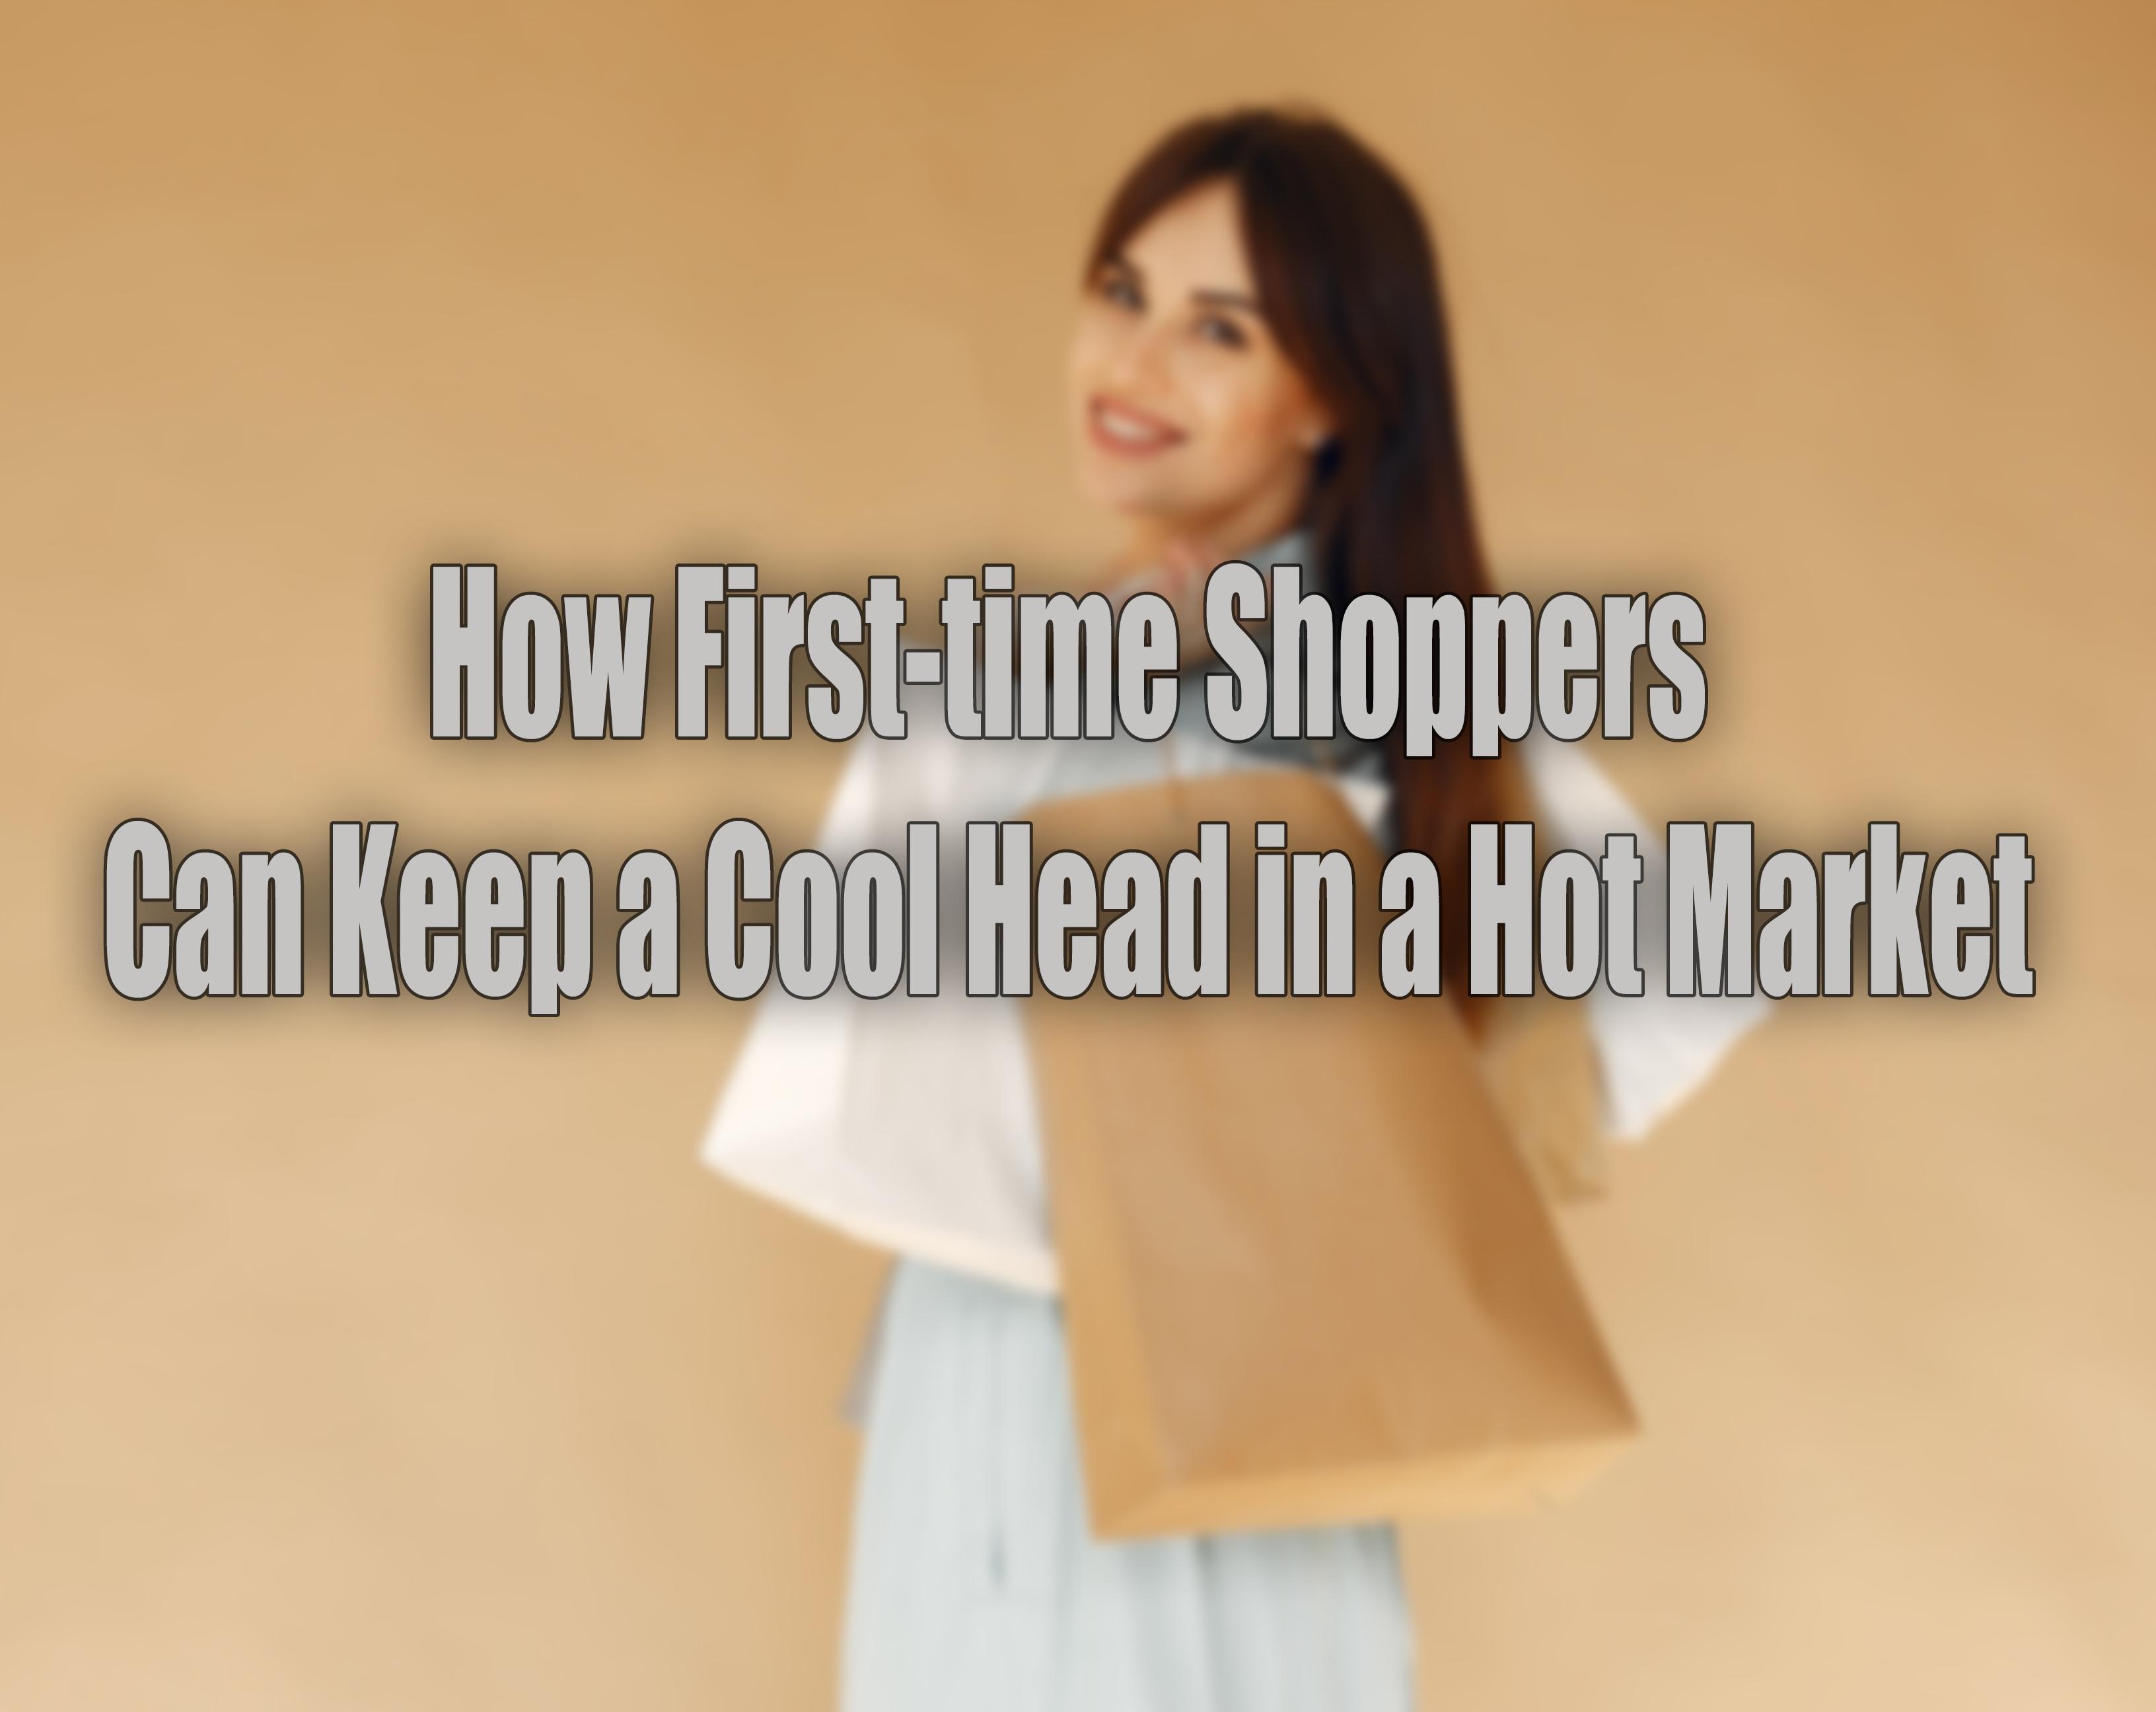 Shoppers in Las Vegas.jpg